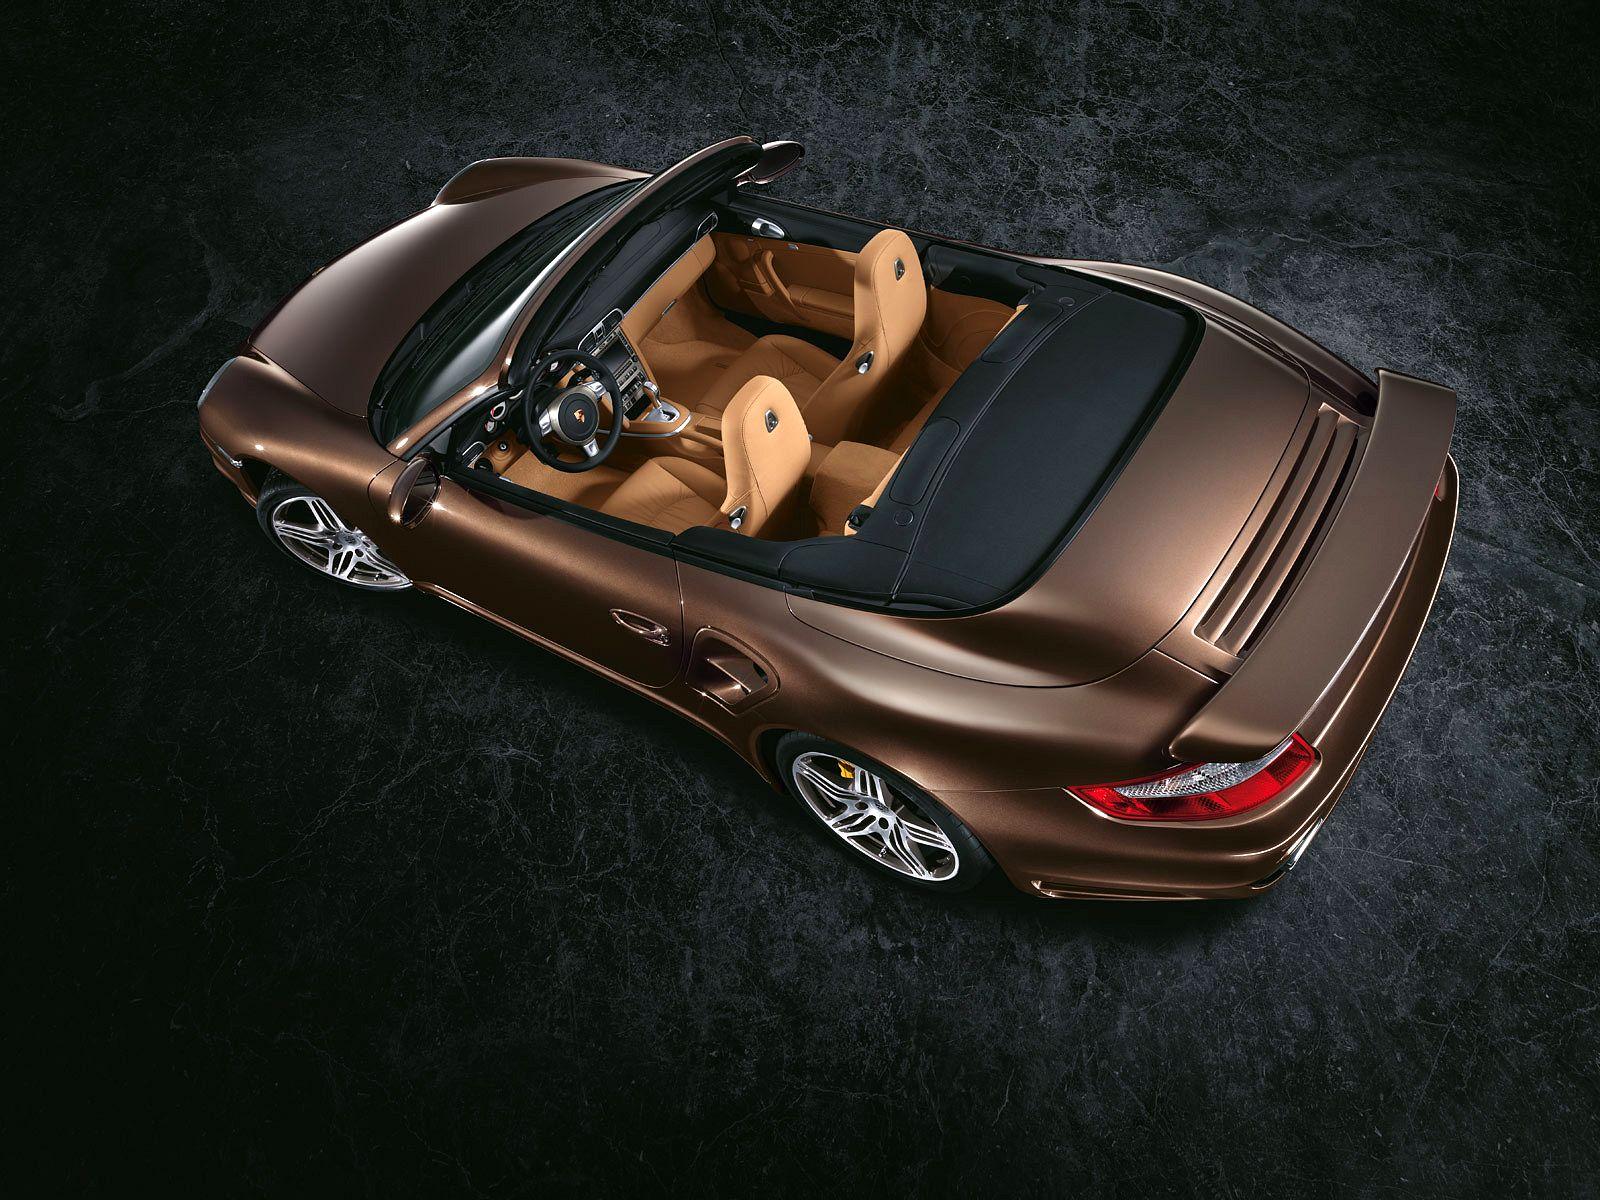 Porsche 911 Turbo Cabriolet Wallpaper 1600x1200 ID677 1600x1200